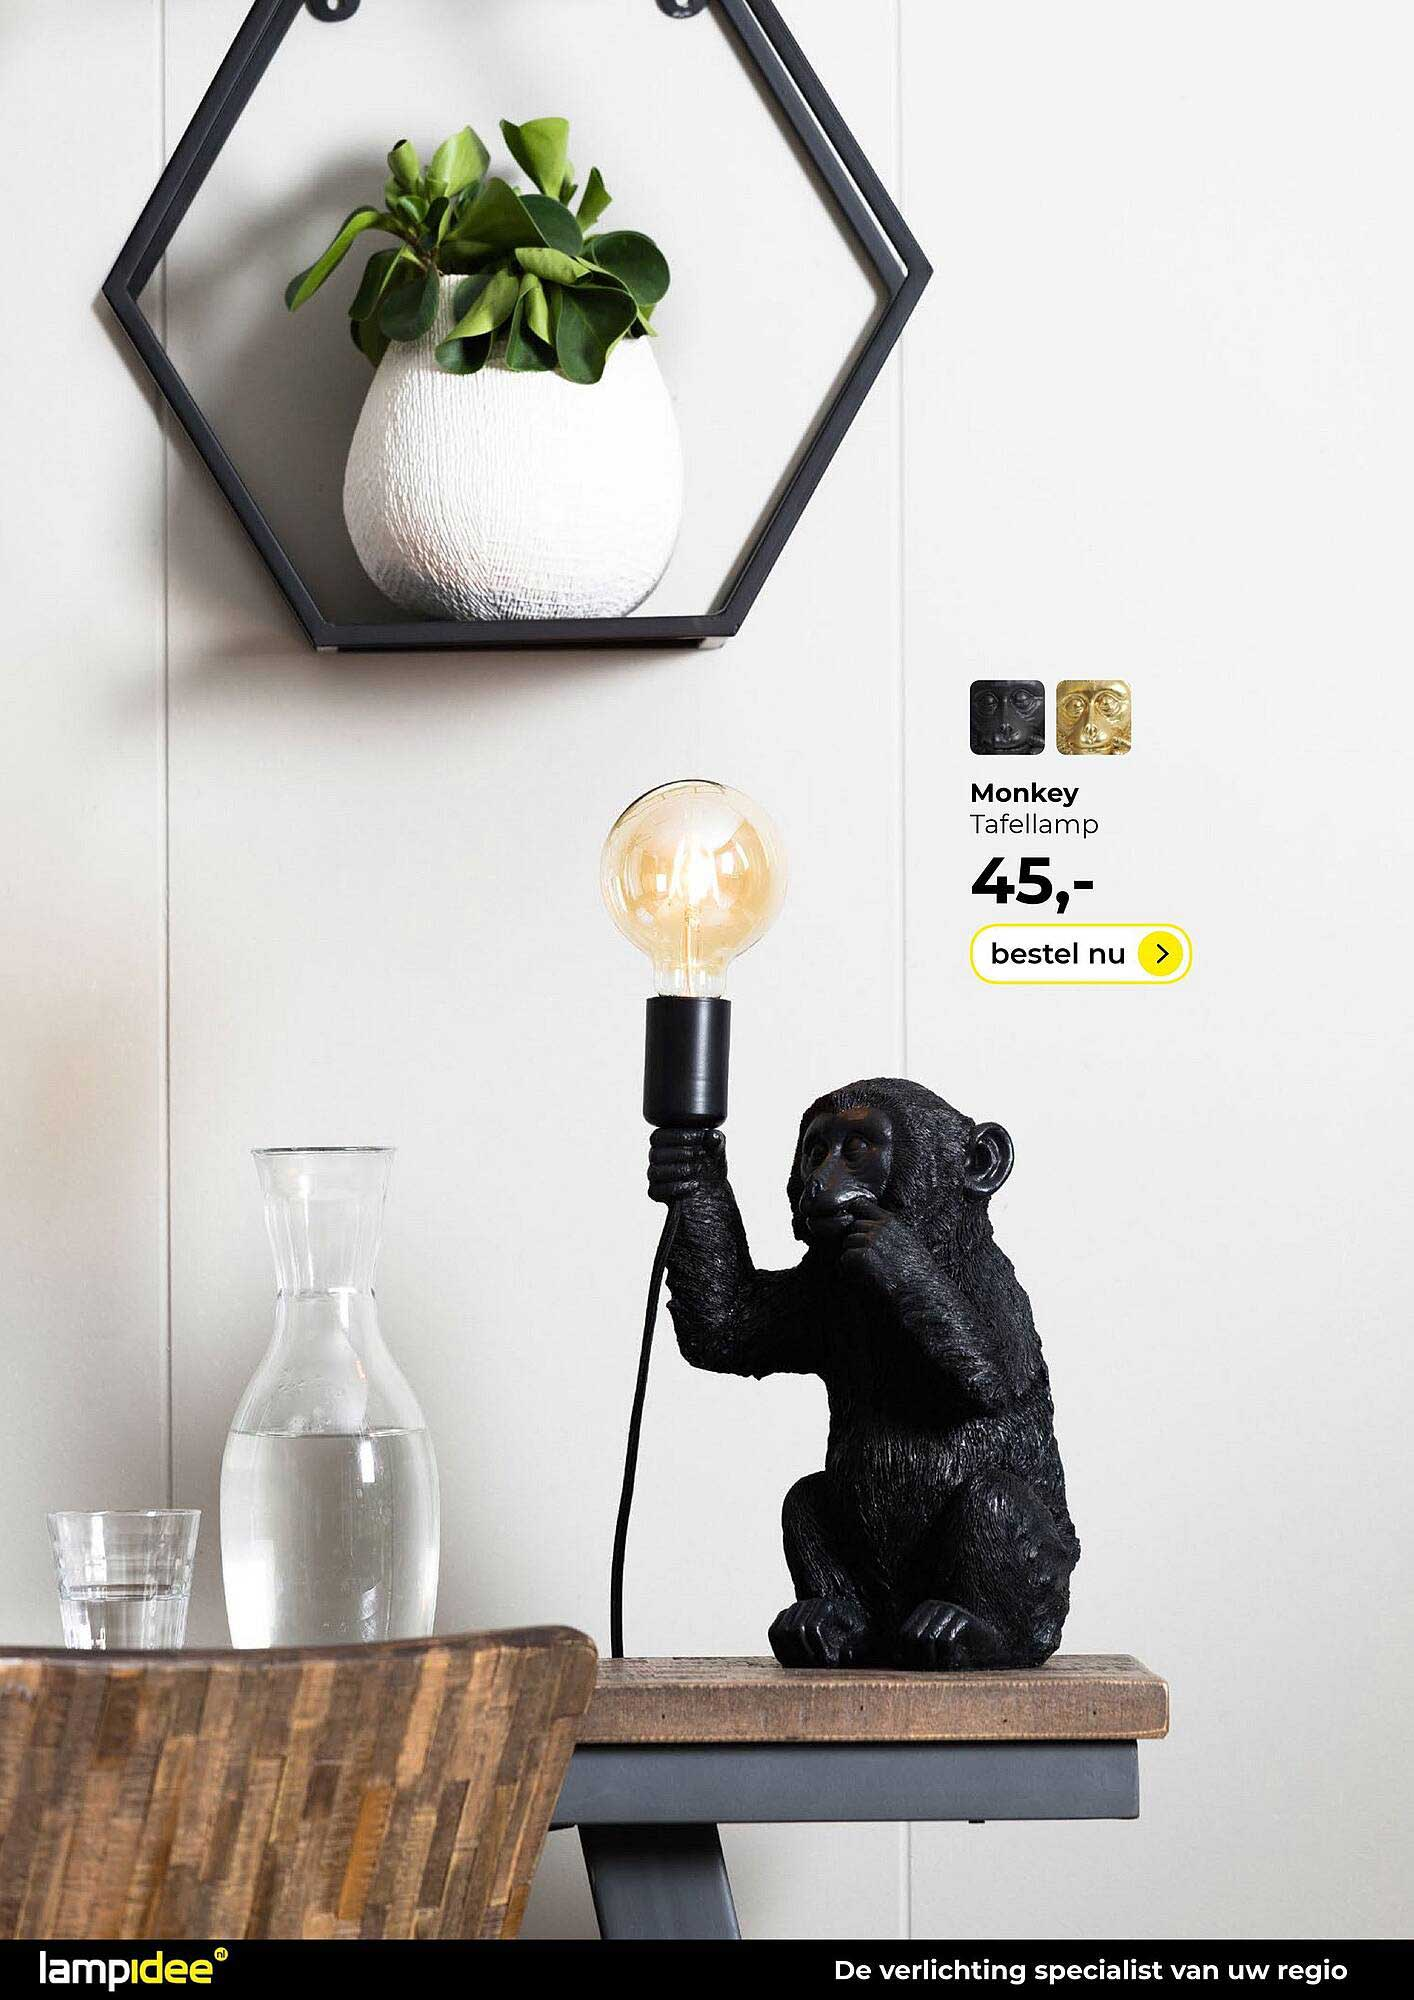 Lampidee Monkey Tafellamp